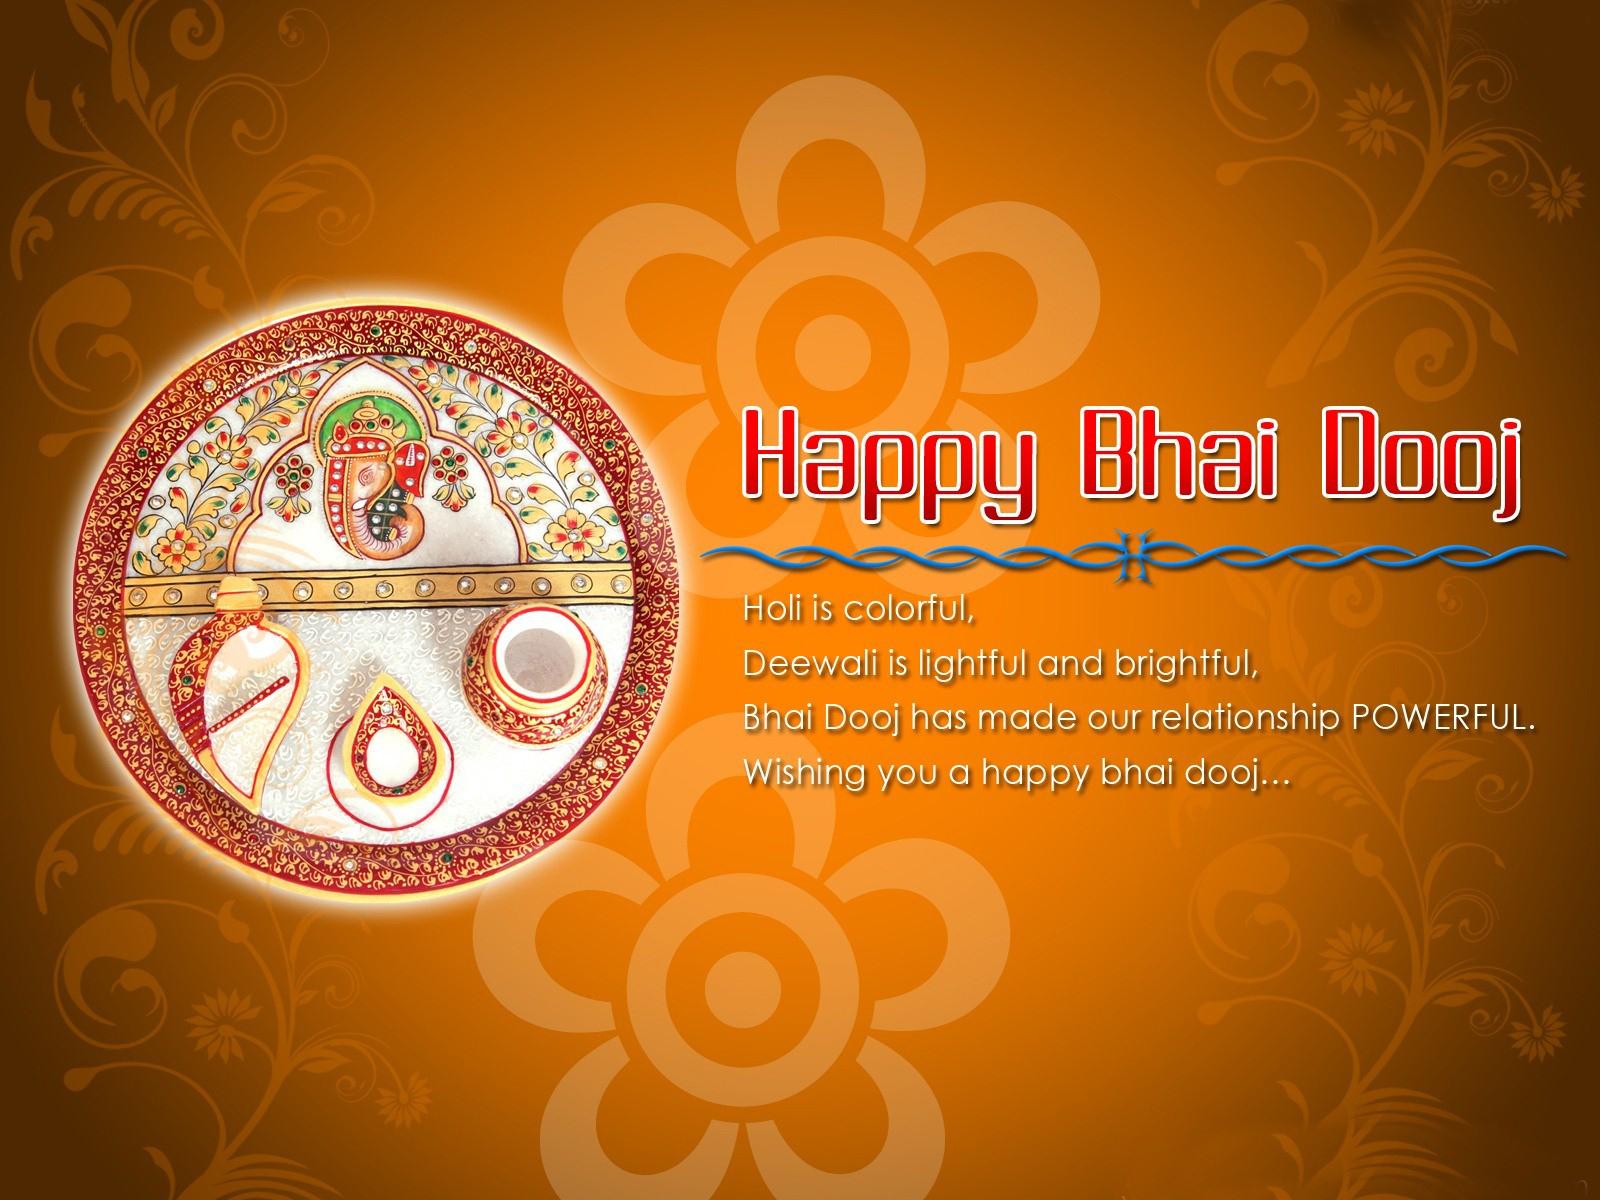 Happy Bhai Dooj Pictures Holi Celebration Bhai Duj